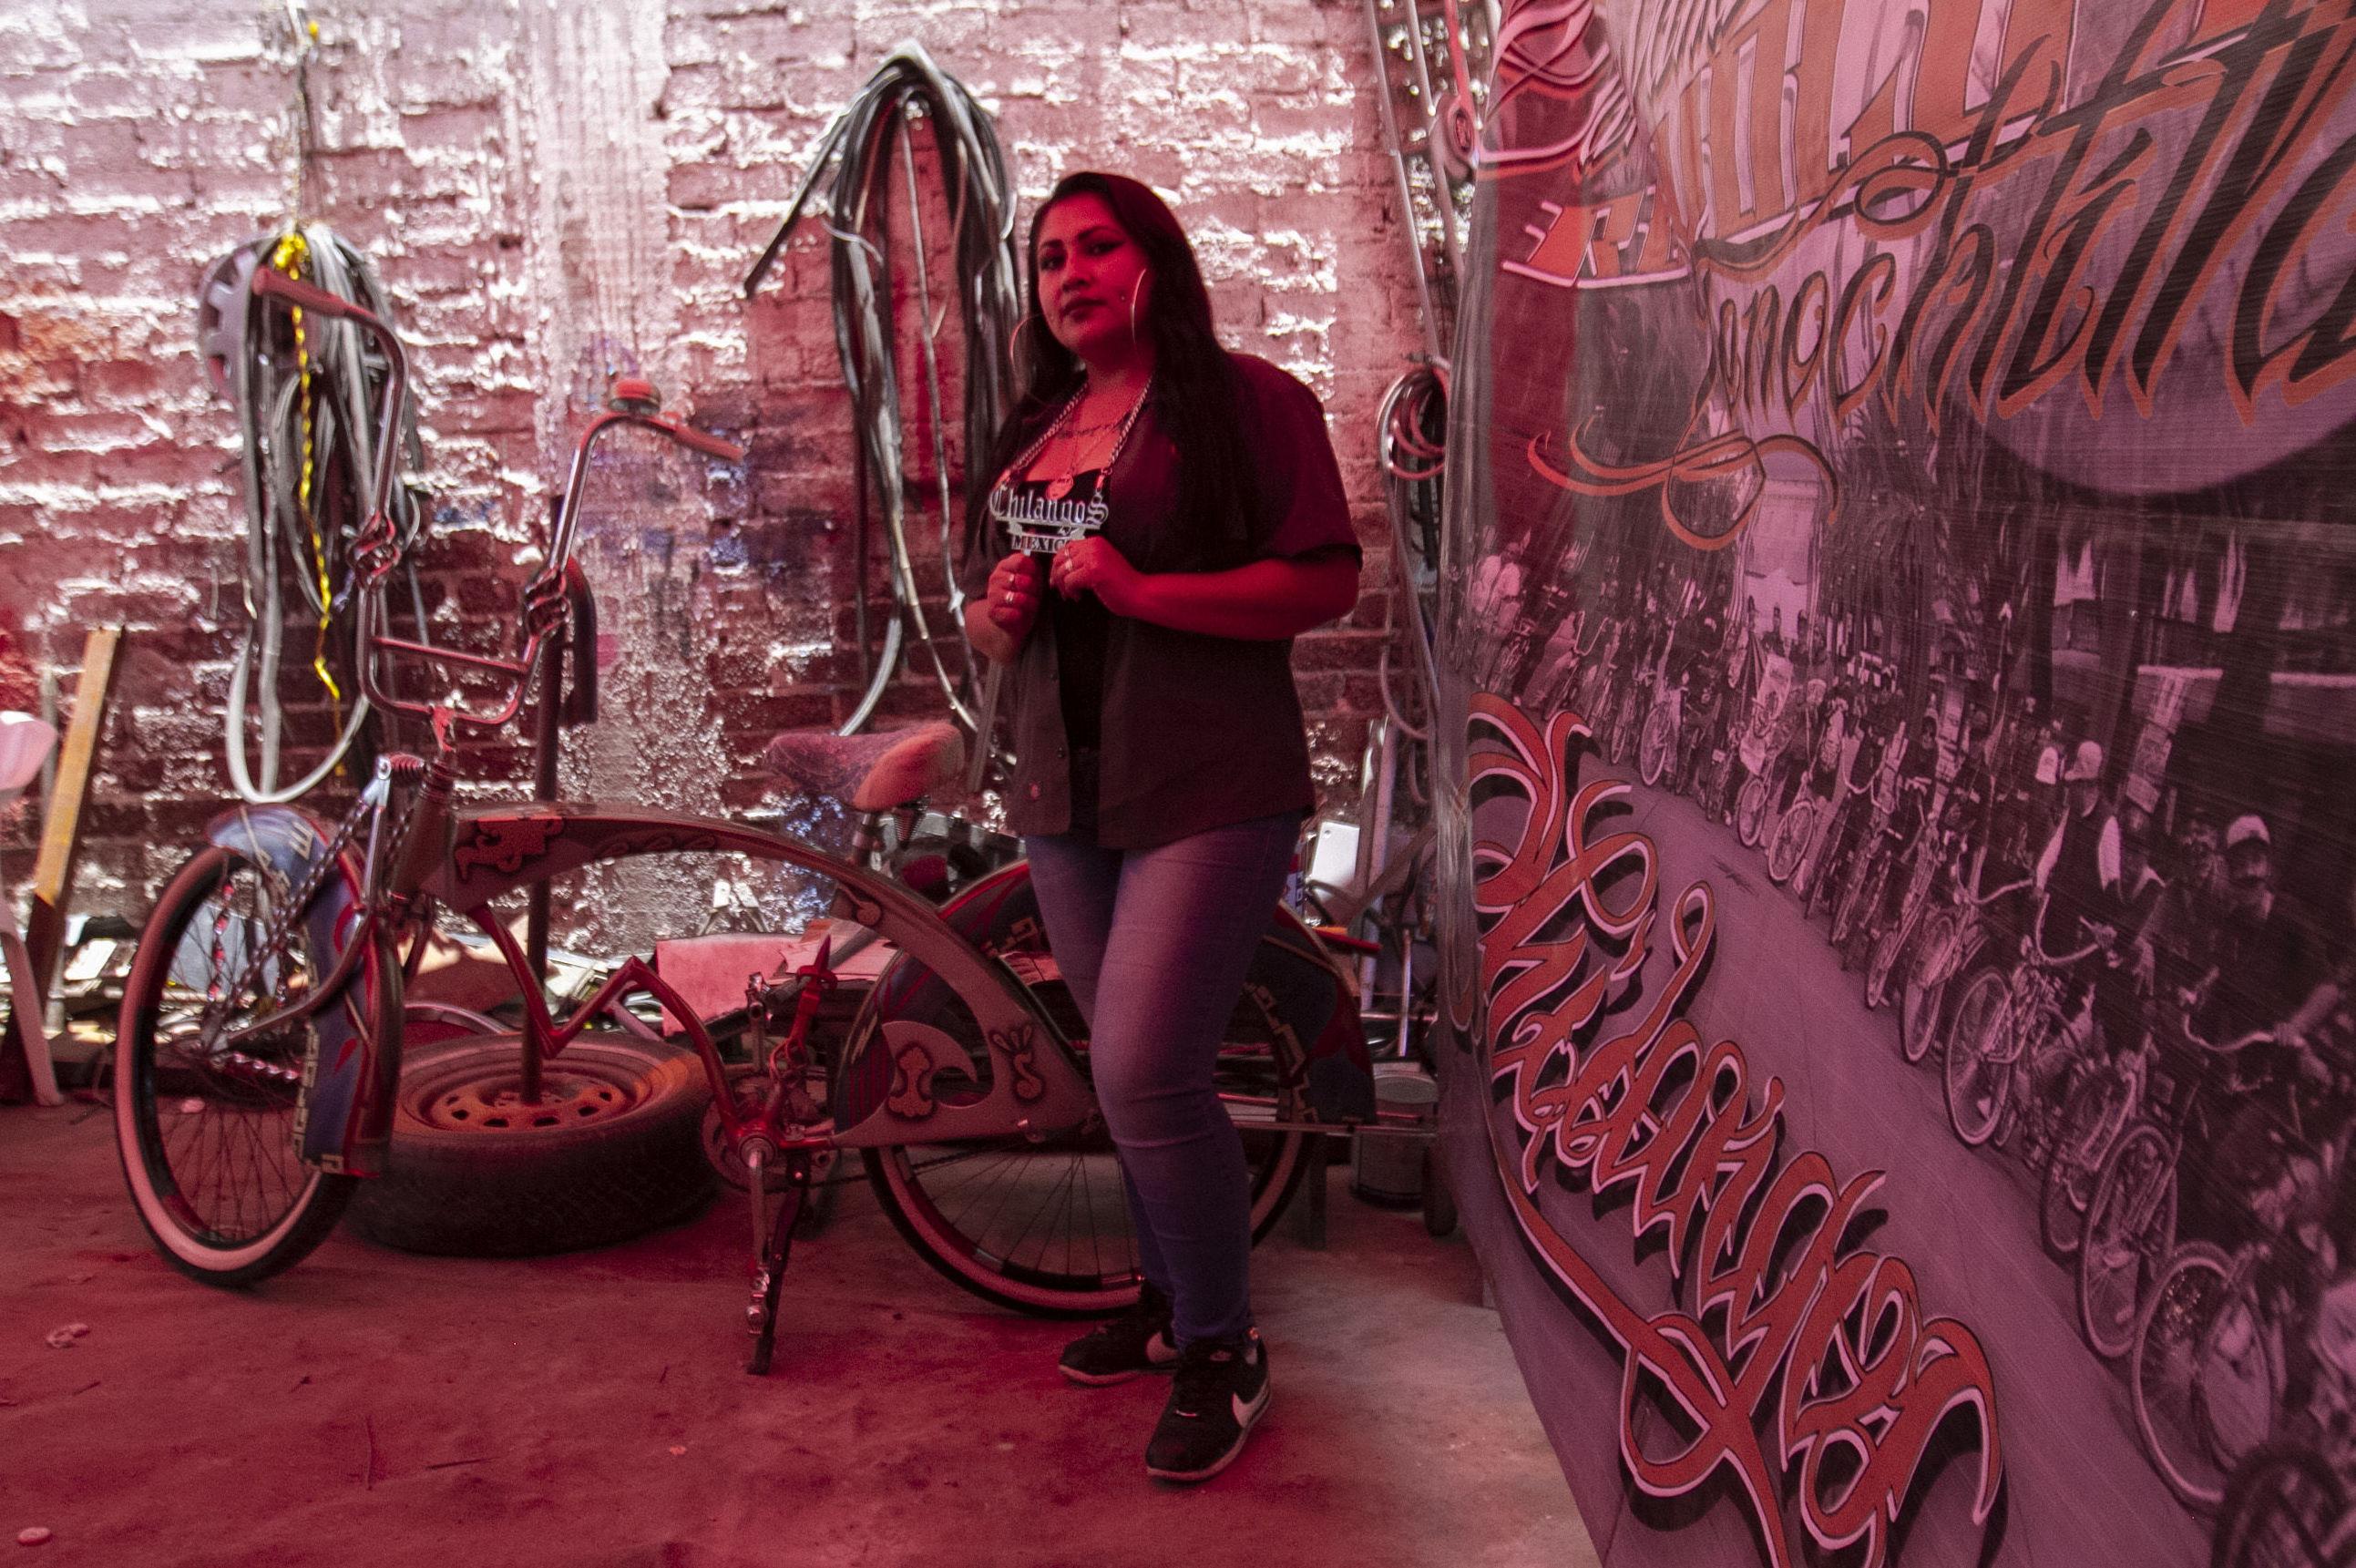 Devanny, administradora del club 'Chiangos Low Bike' posa para foto